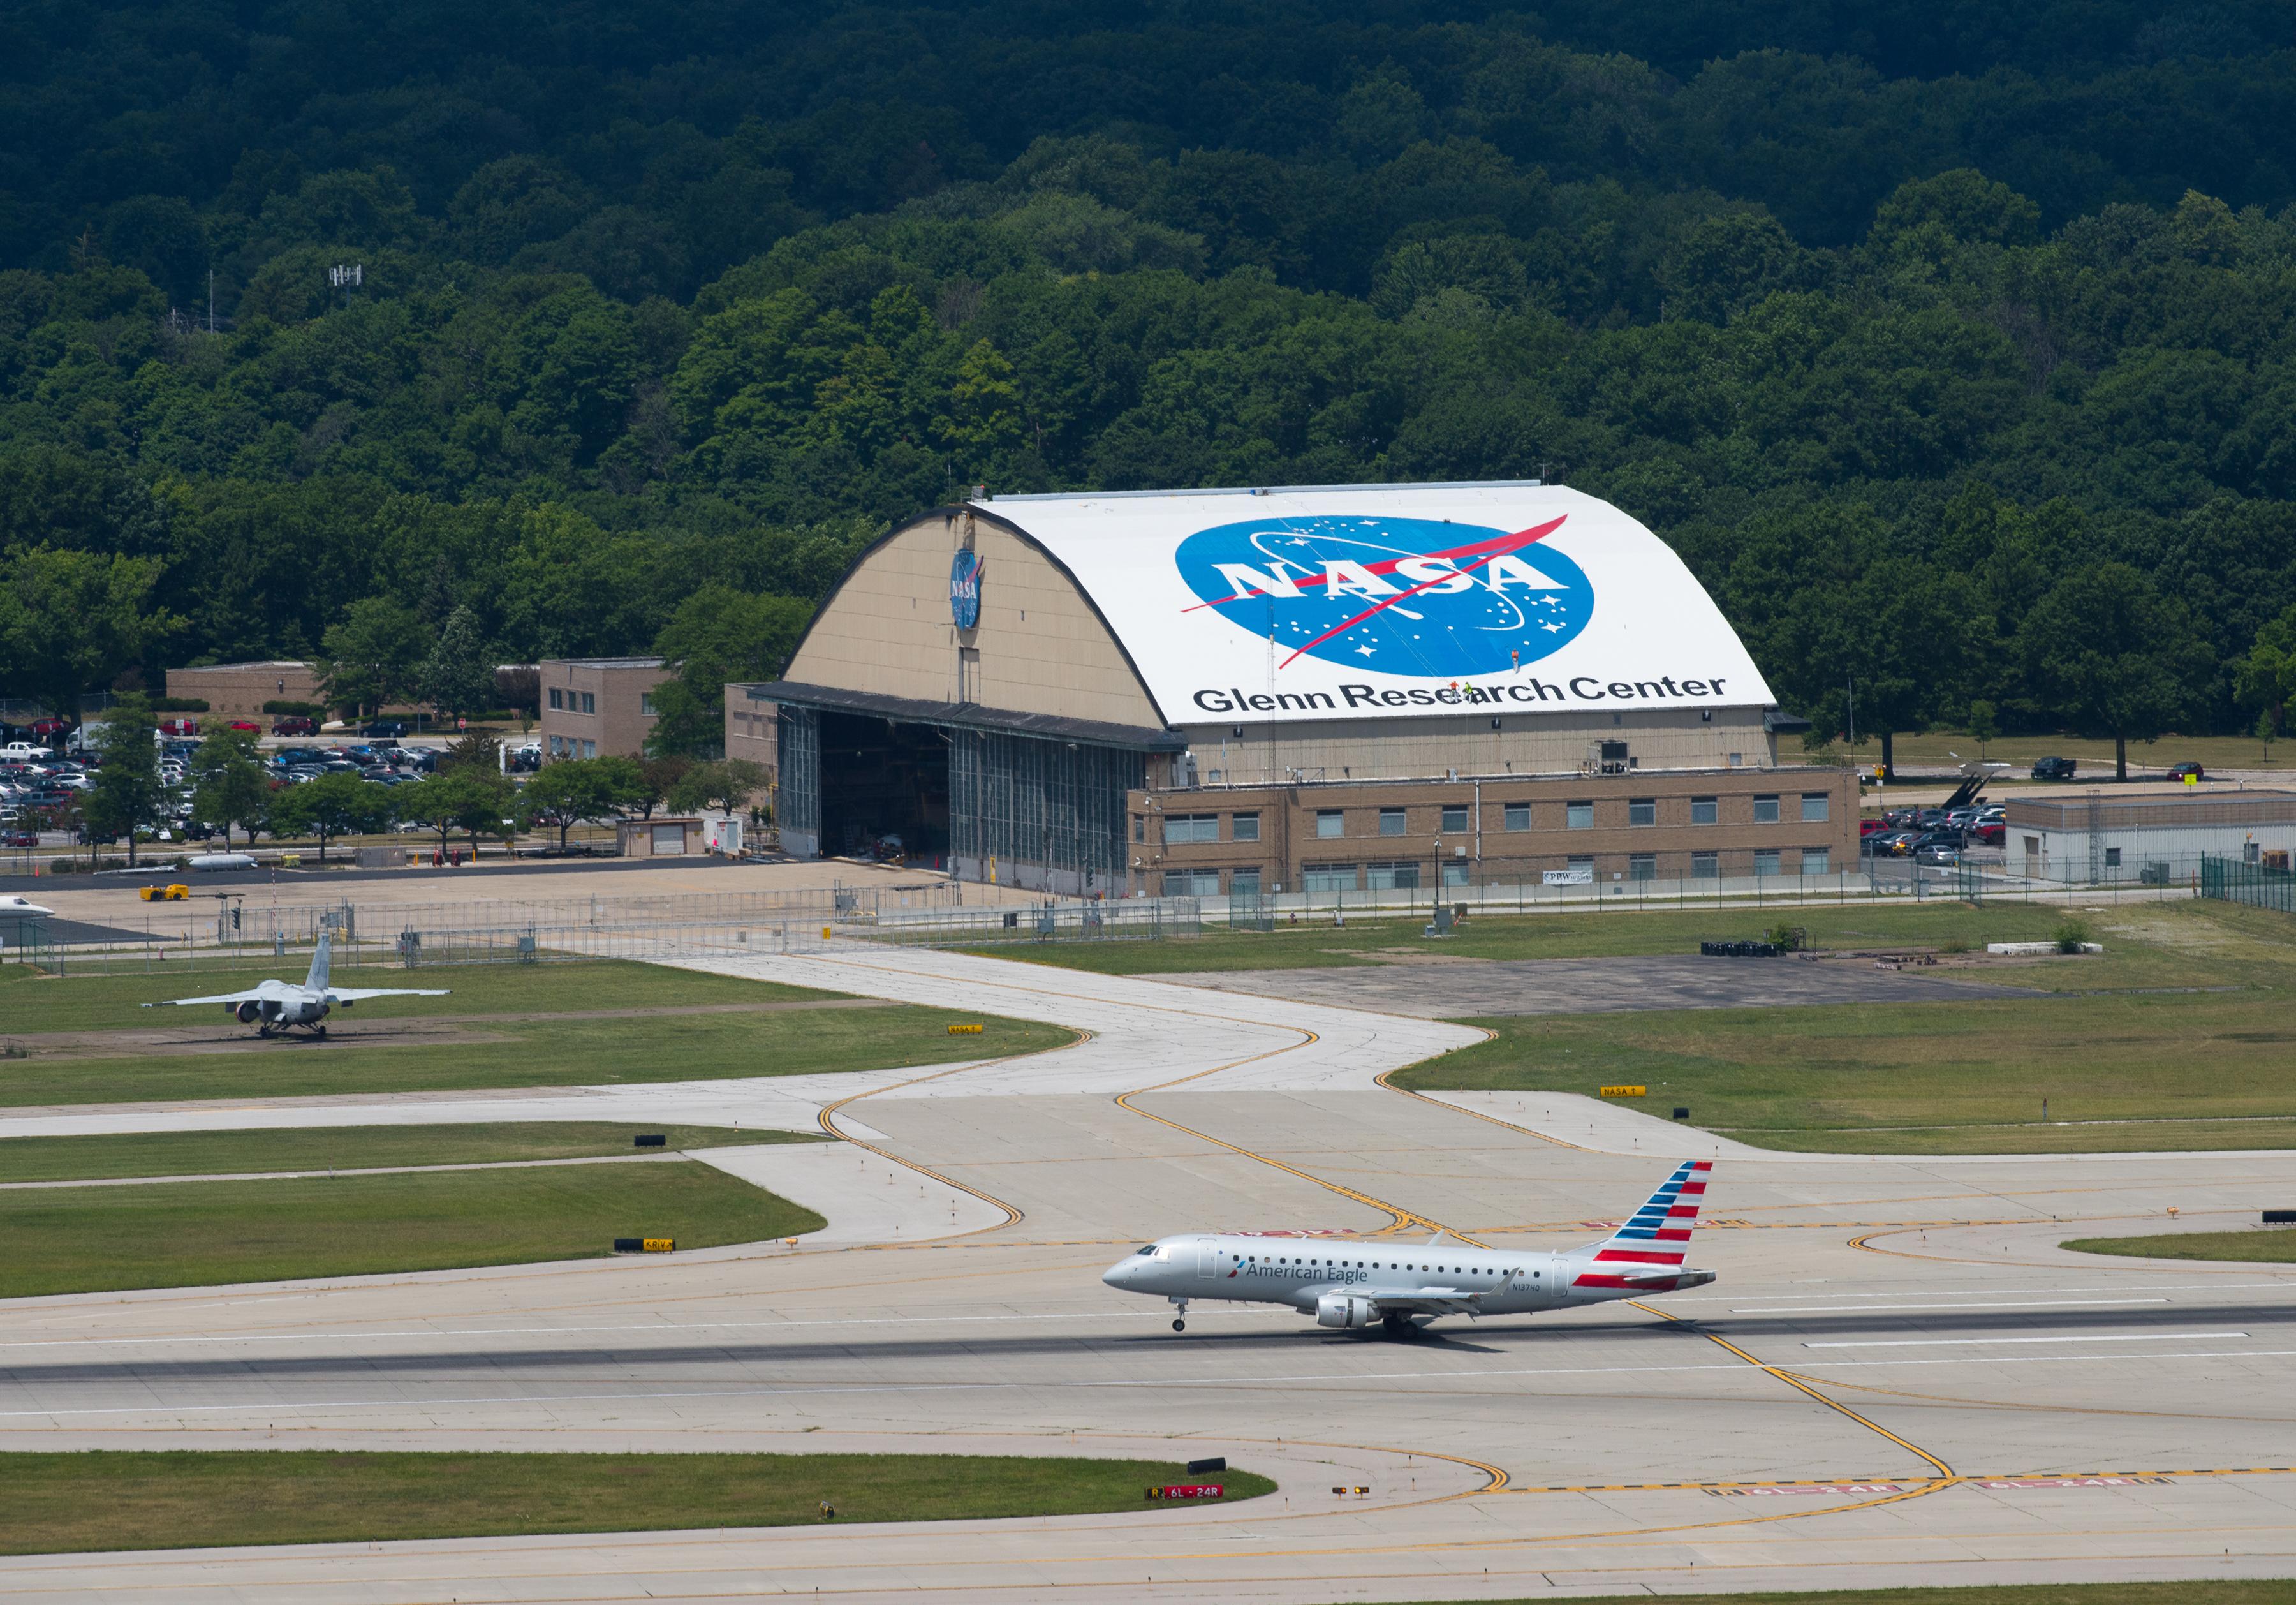 NASA Glenn Research Center Announces Free Public Tours   NASA